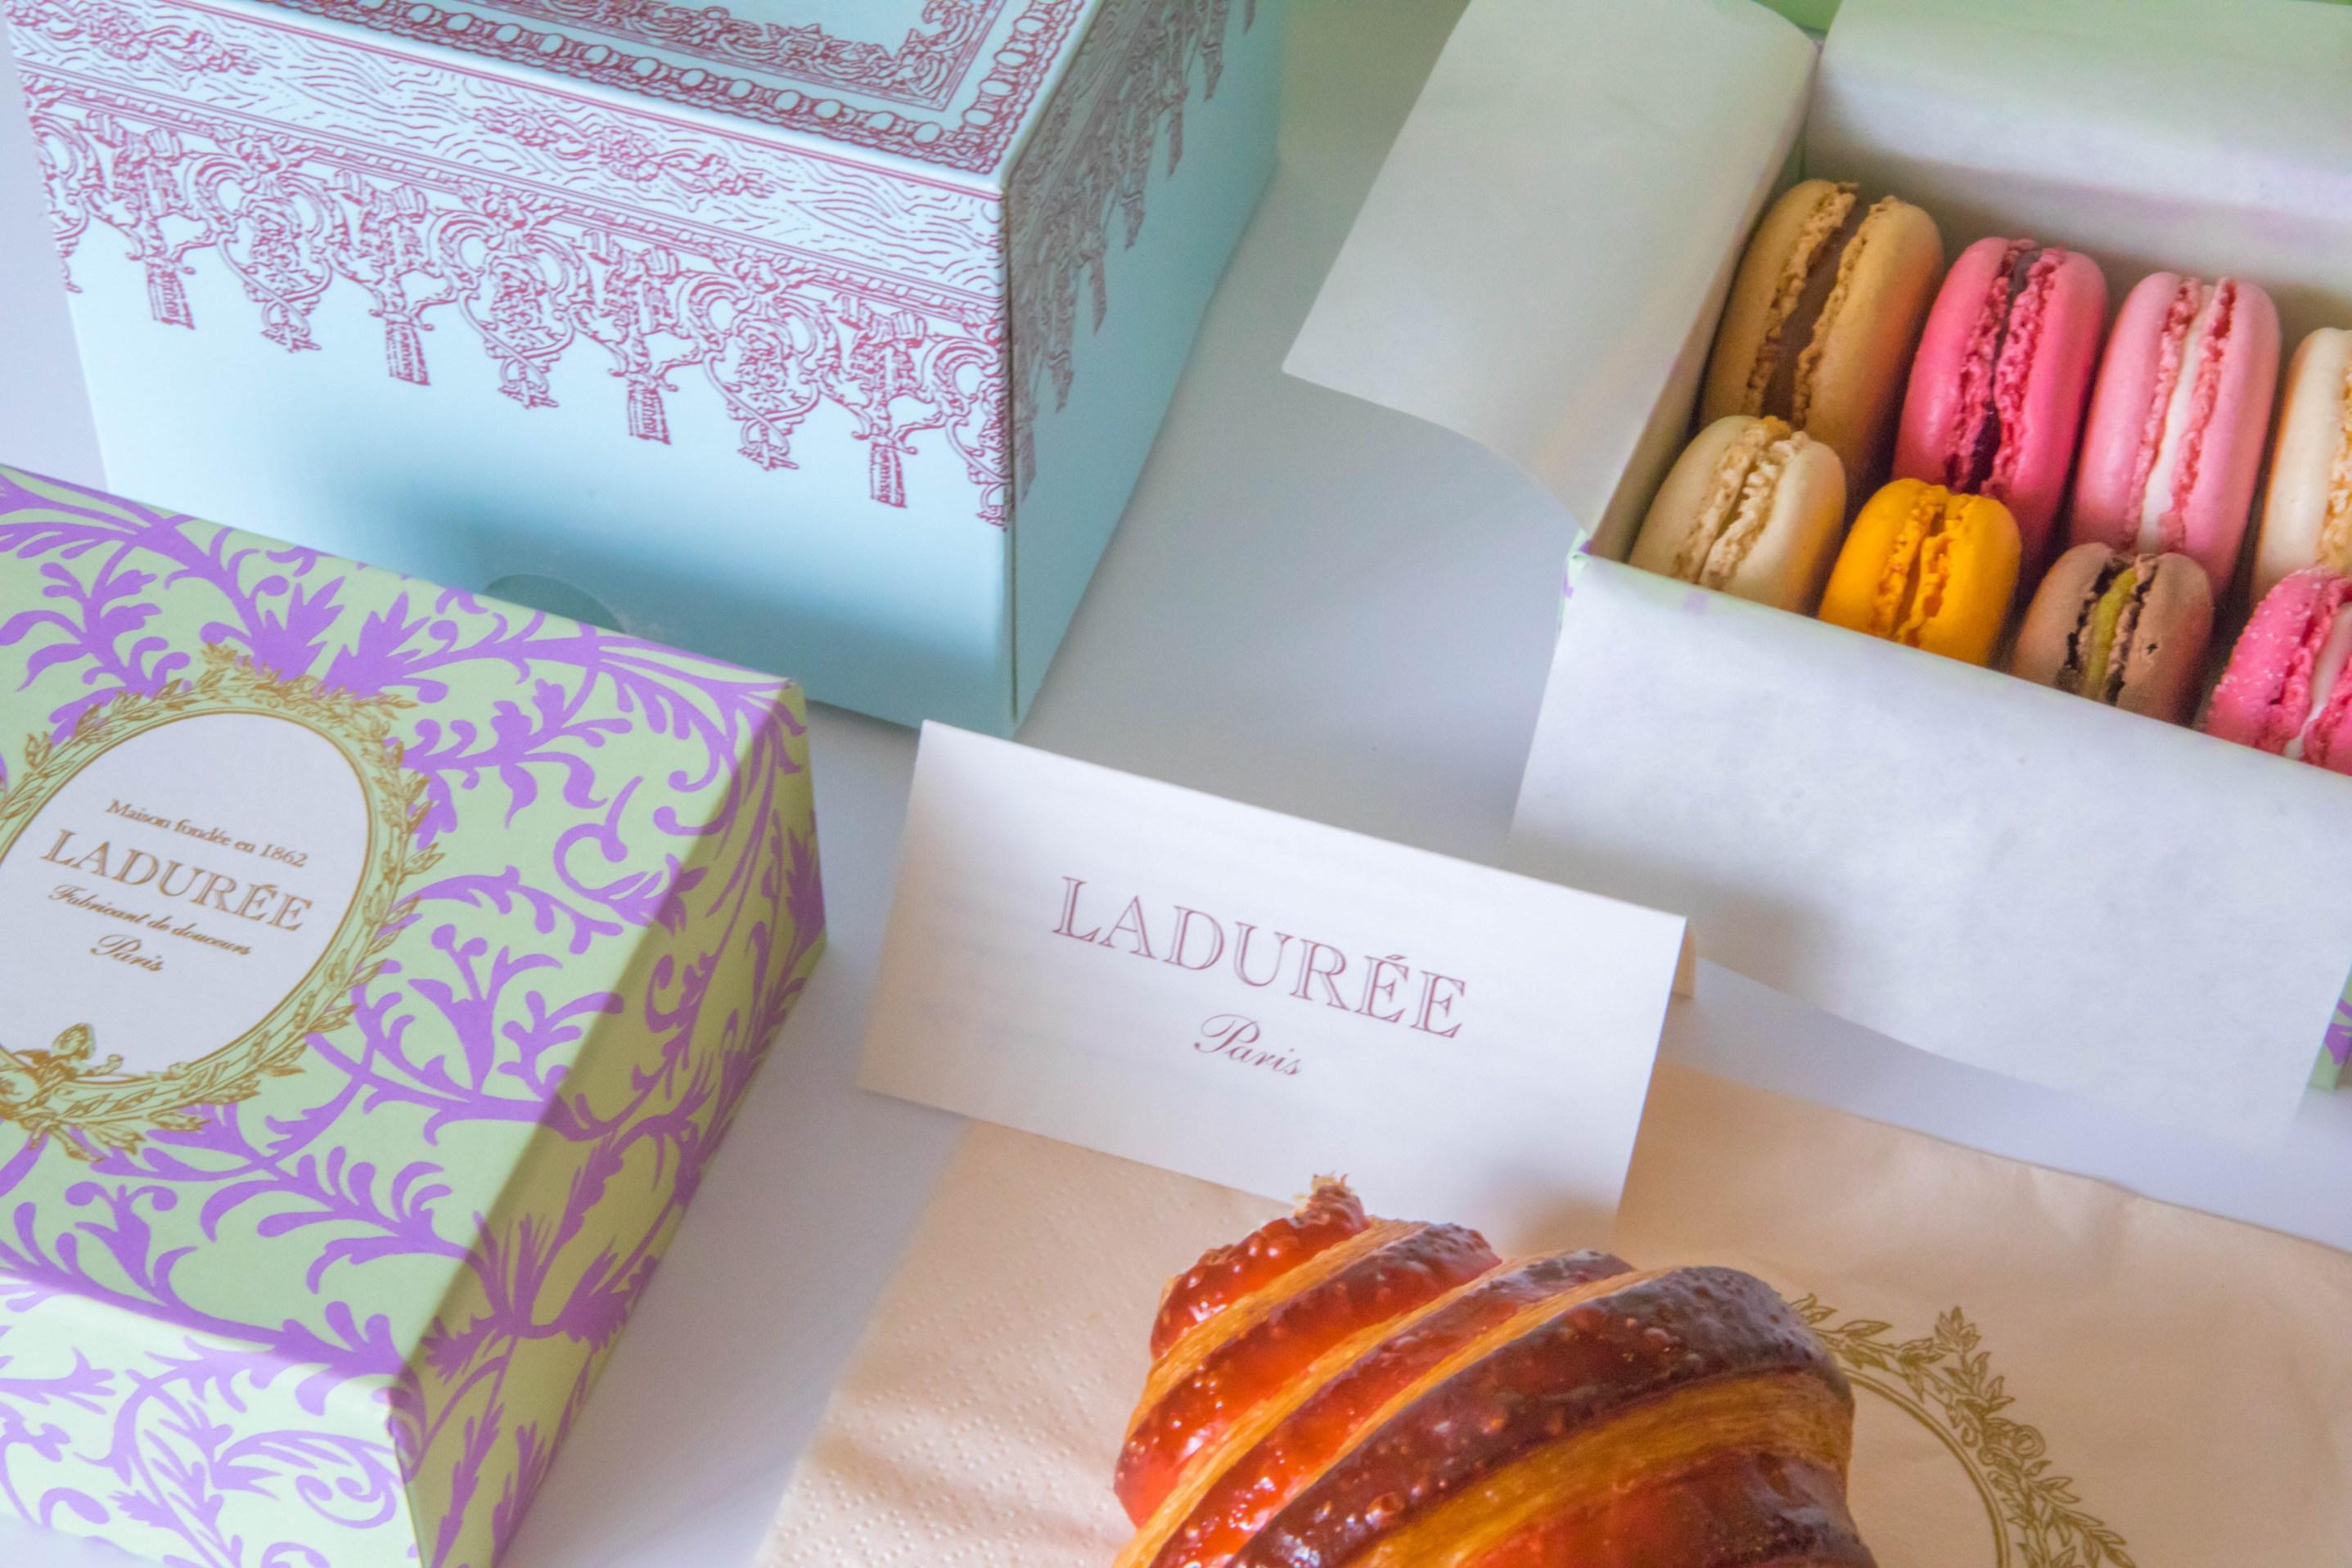 Laduree Macarons from Laduree Bakery in Soho New York City Paris